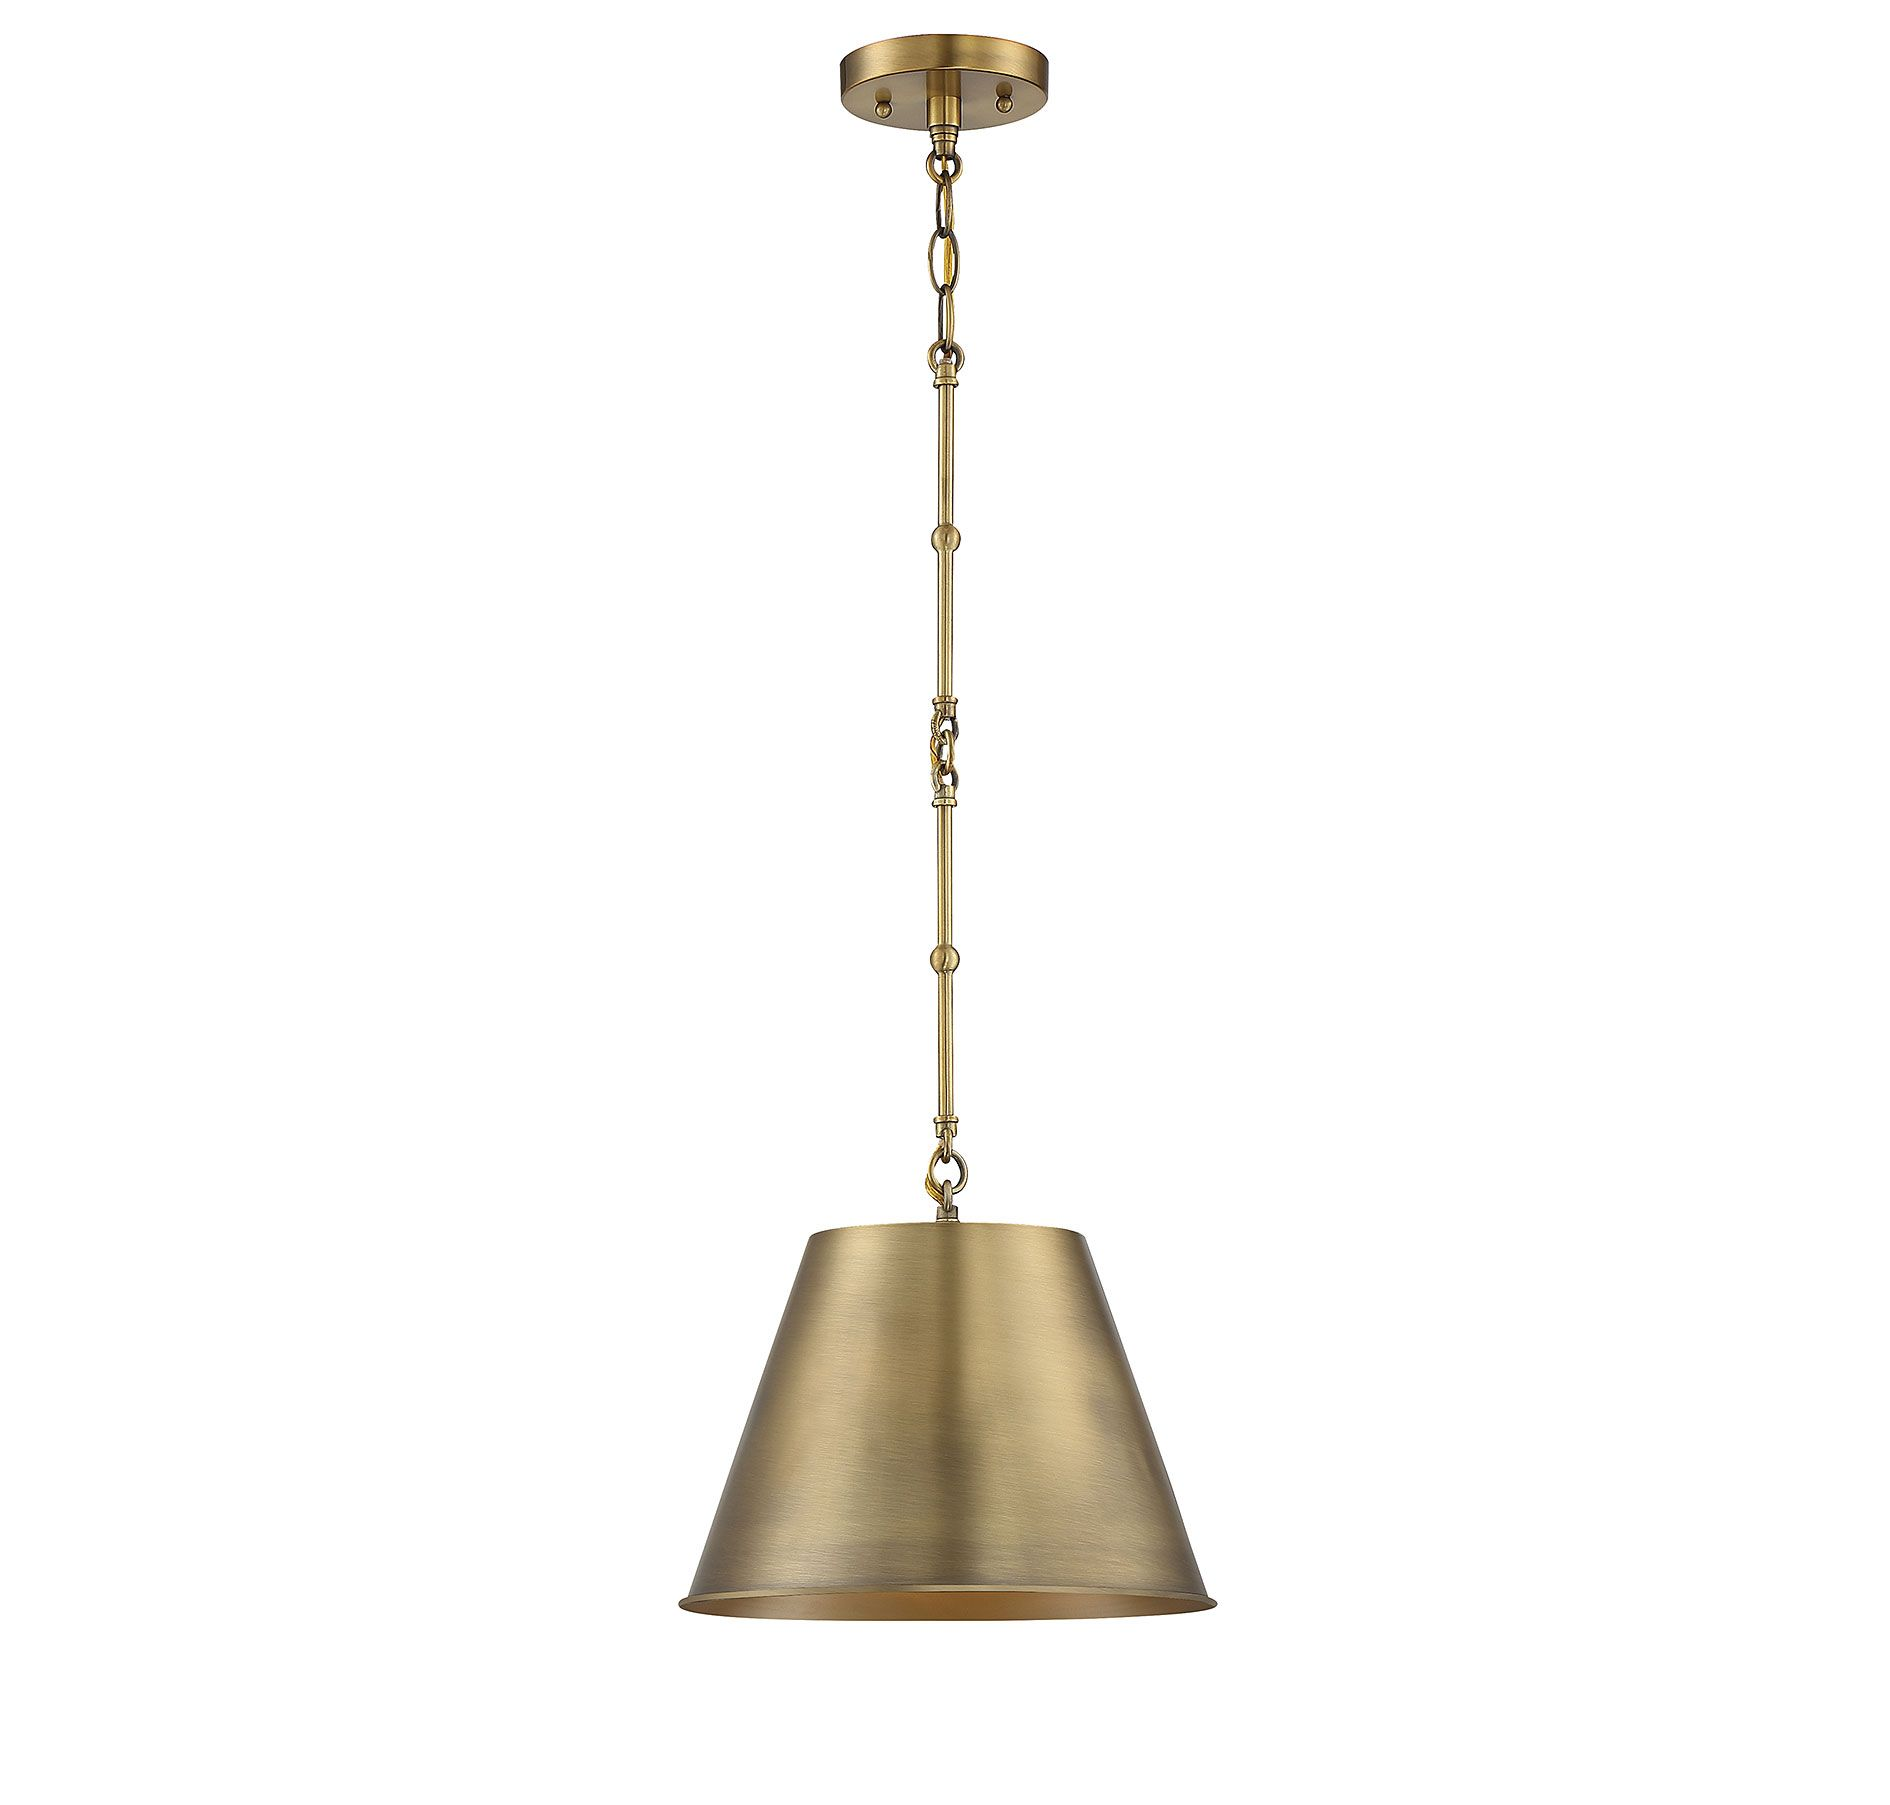 wholesale dealer 229dc 37519 Savoy House Alden Hanging Pendant in Warm Brass